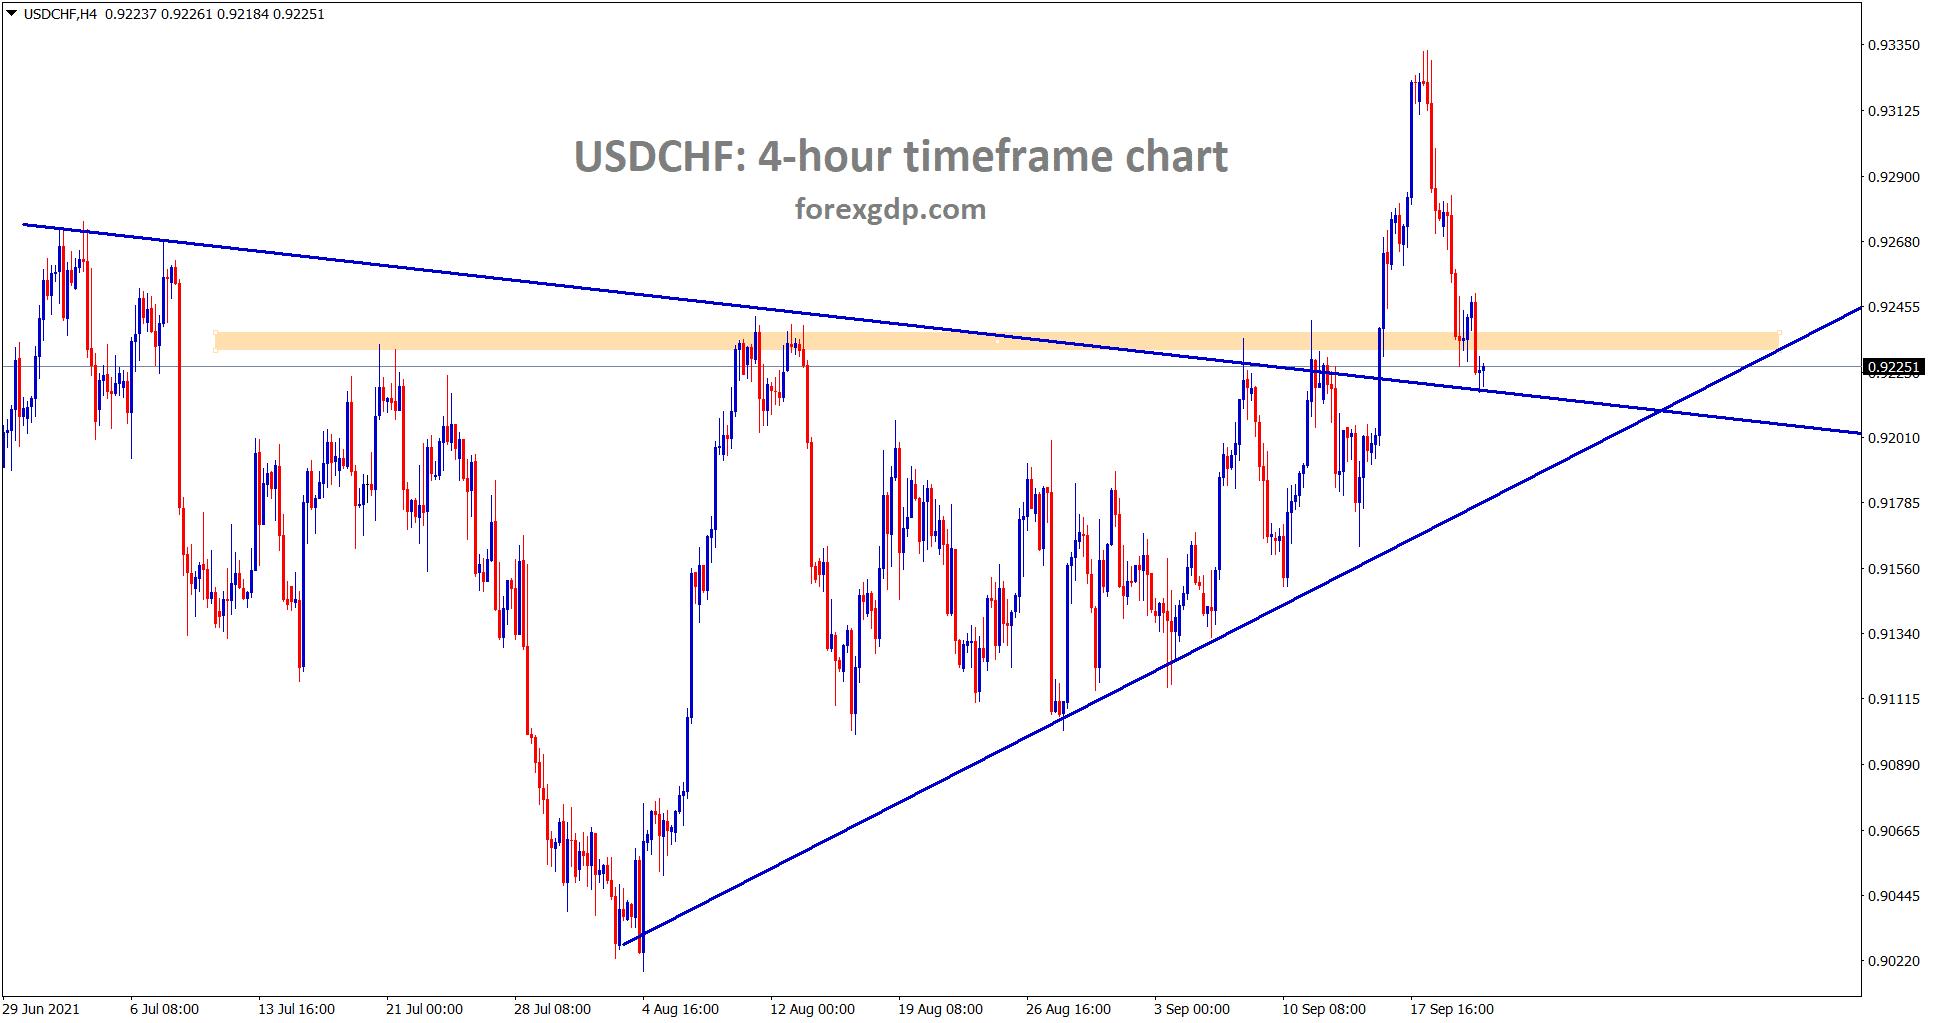 USDCHF retested the broken symmetrical triangle area